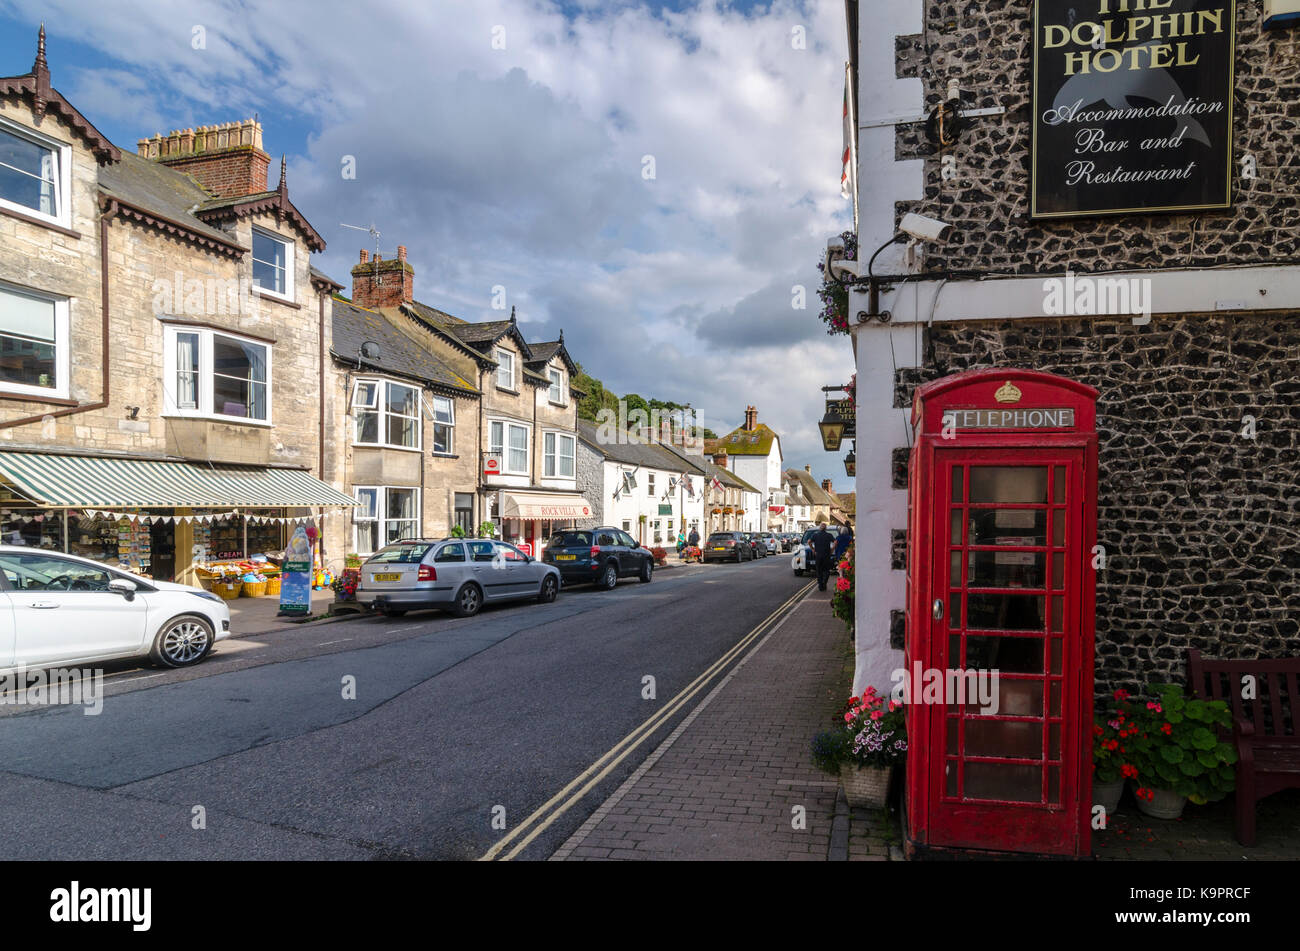 Telephone box on Fore Street, Beer, English Seaside Coastal town, East Devon Coast, England, UK - Stock Image